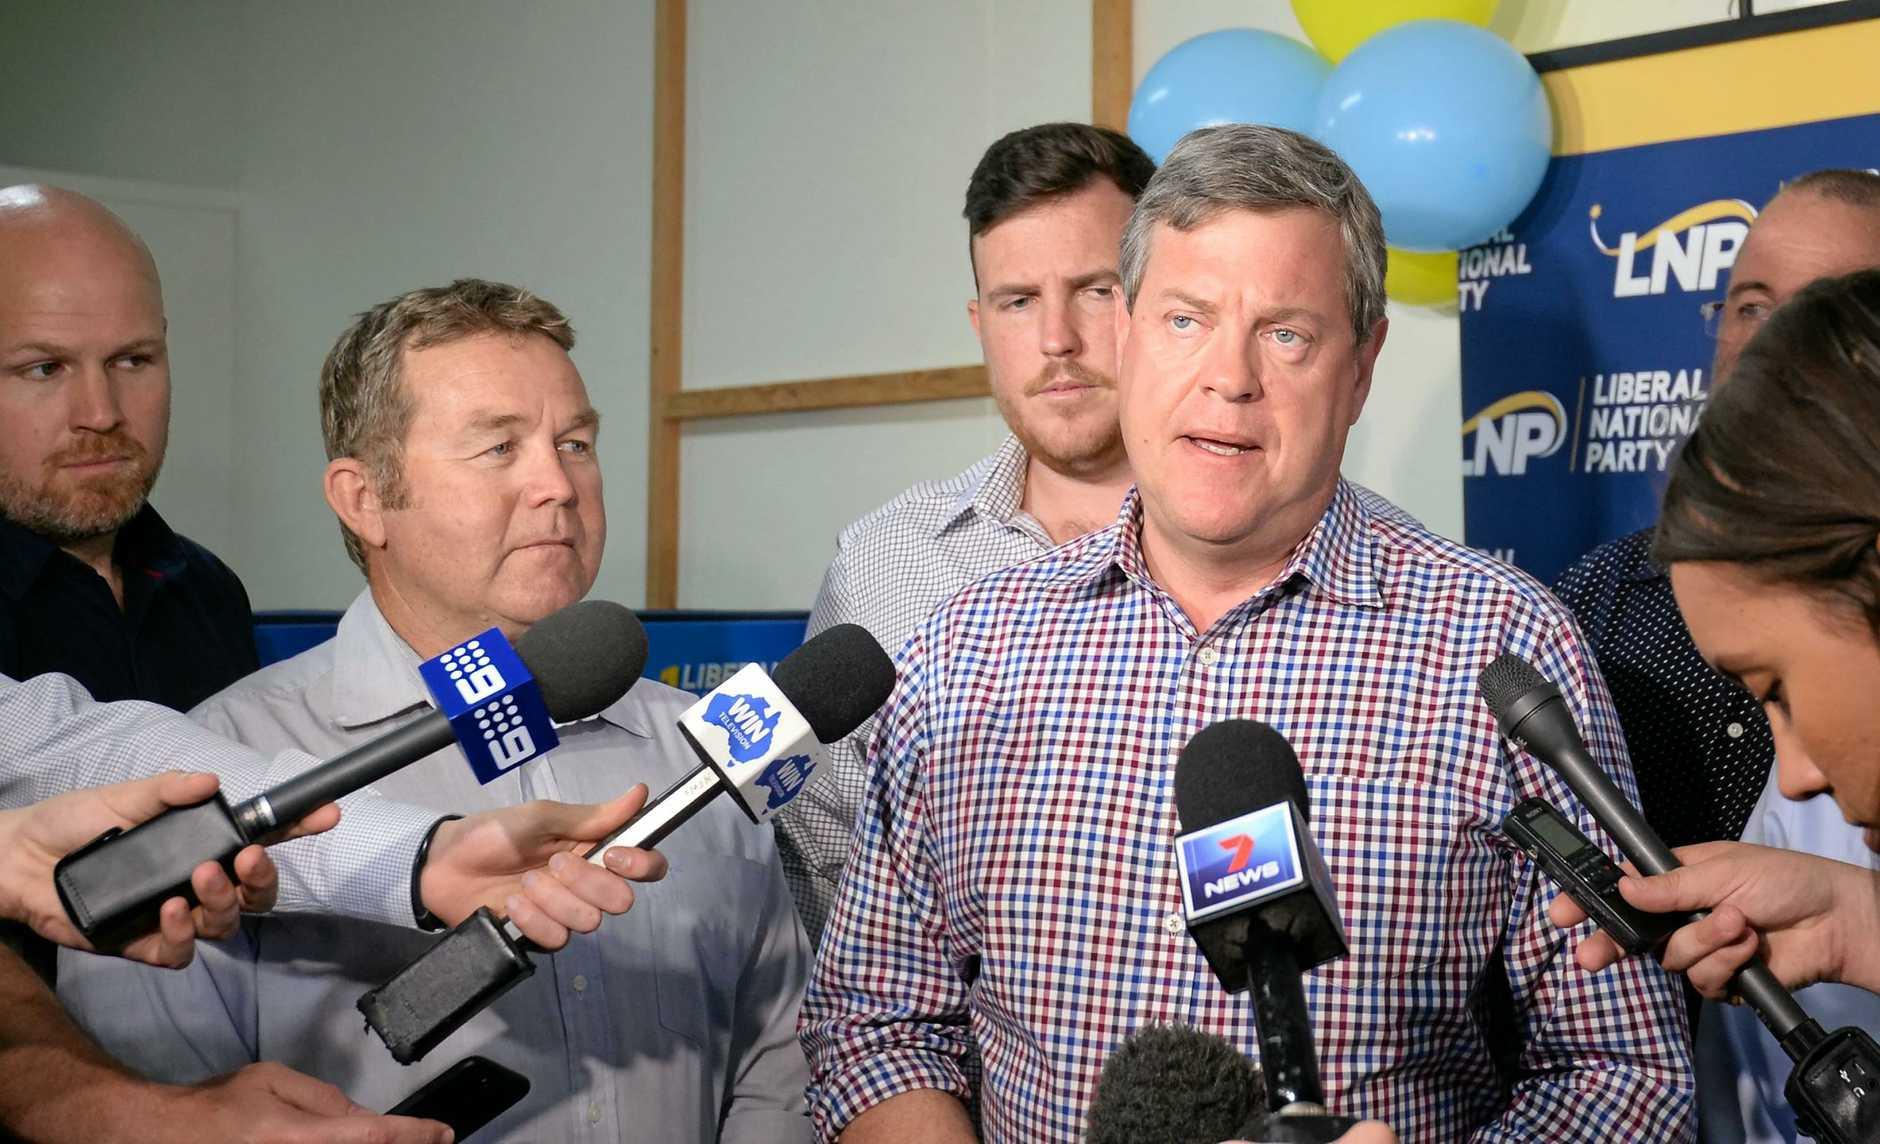 LNP Leader Tim Nicholls in Rockhampton.